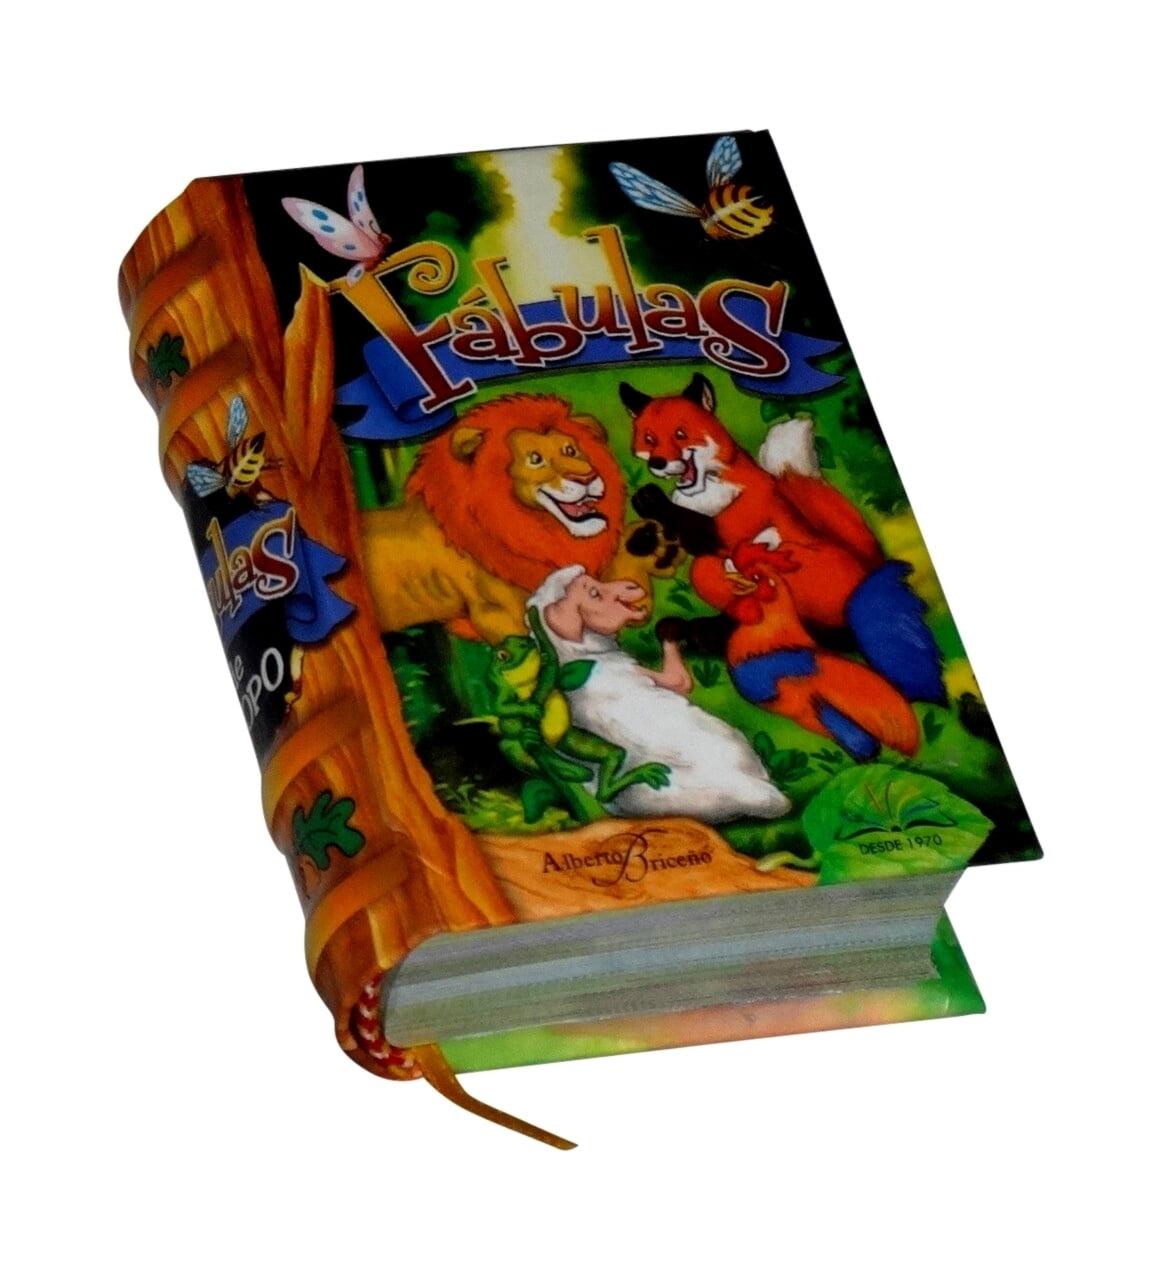 fabulas-miniature-book-libro